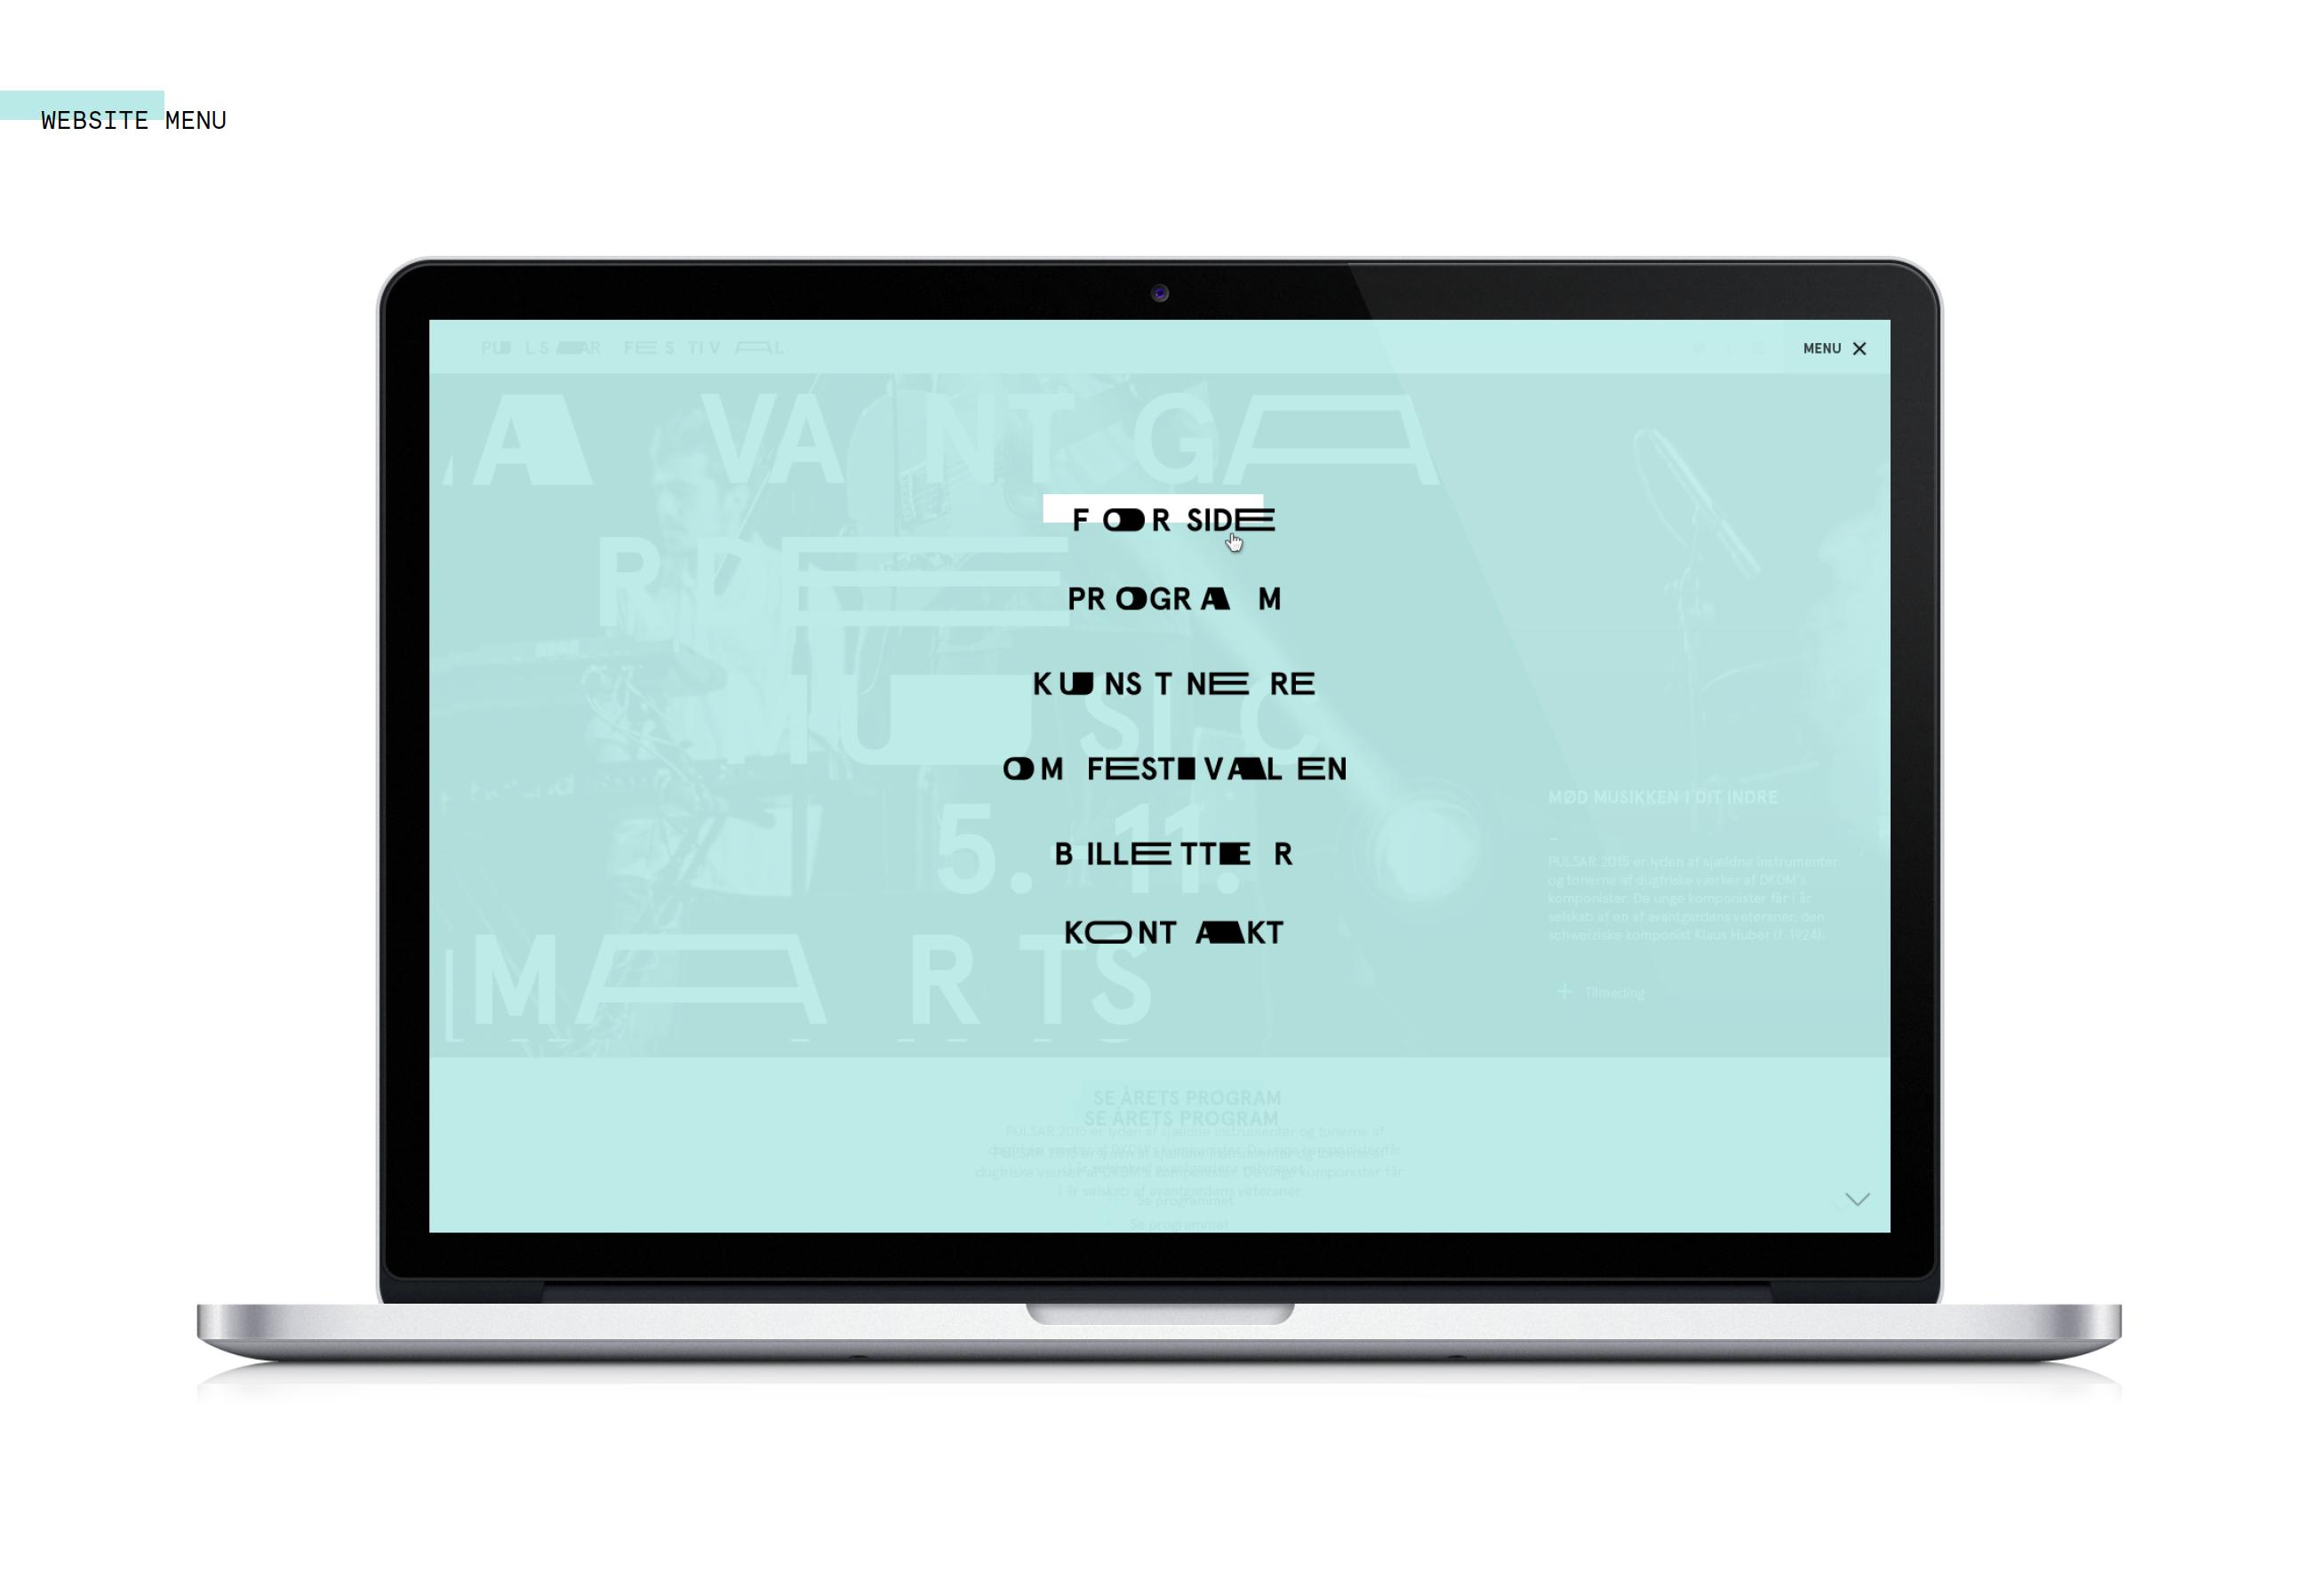 pulsar_philipjohansen_website_menu